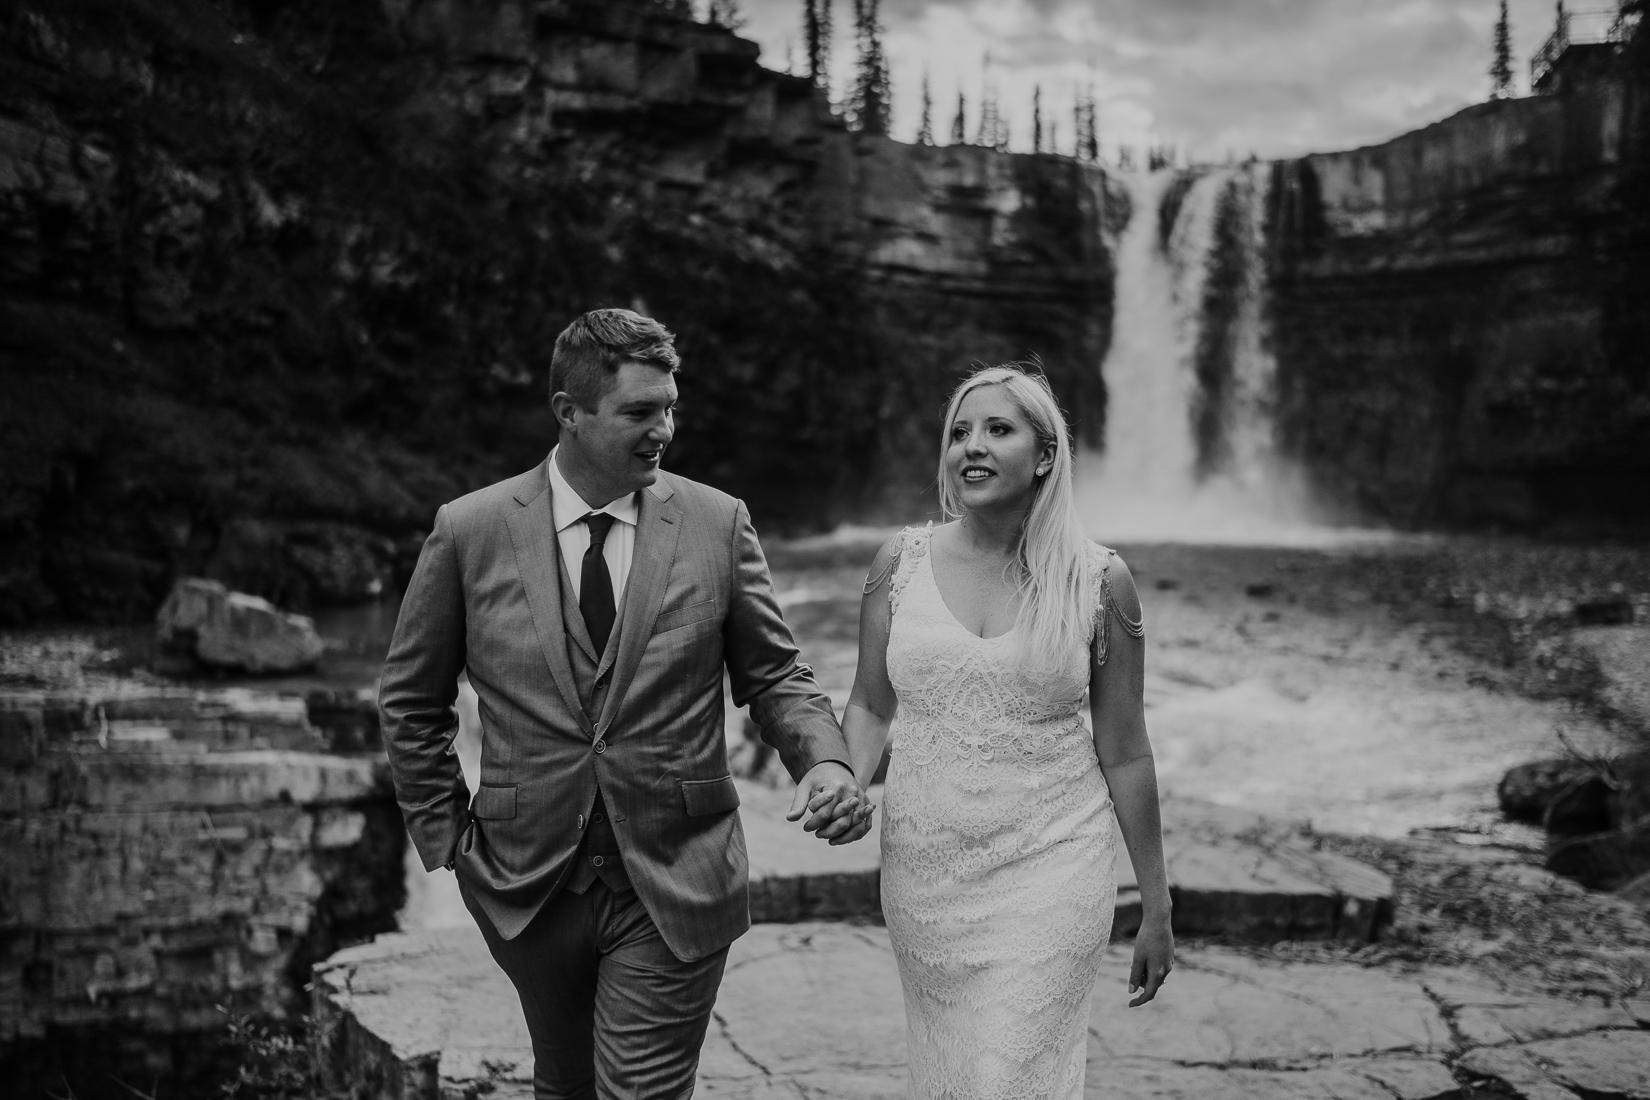 nordegg intimate wedding